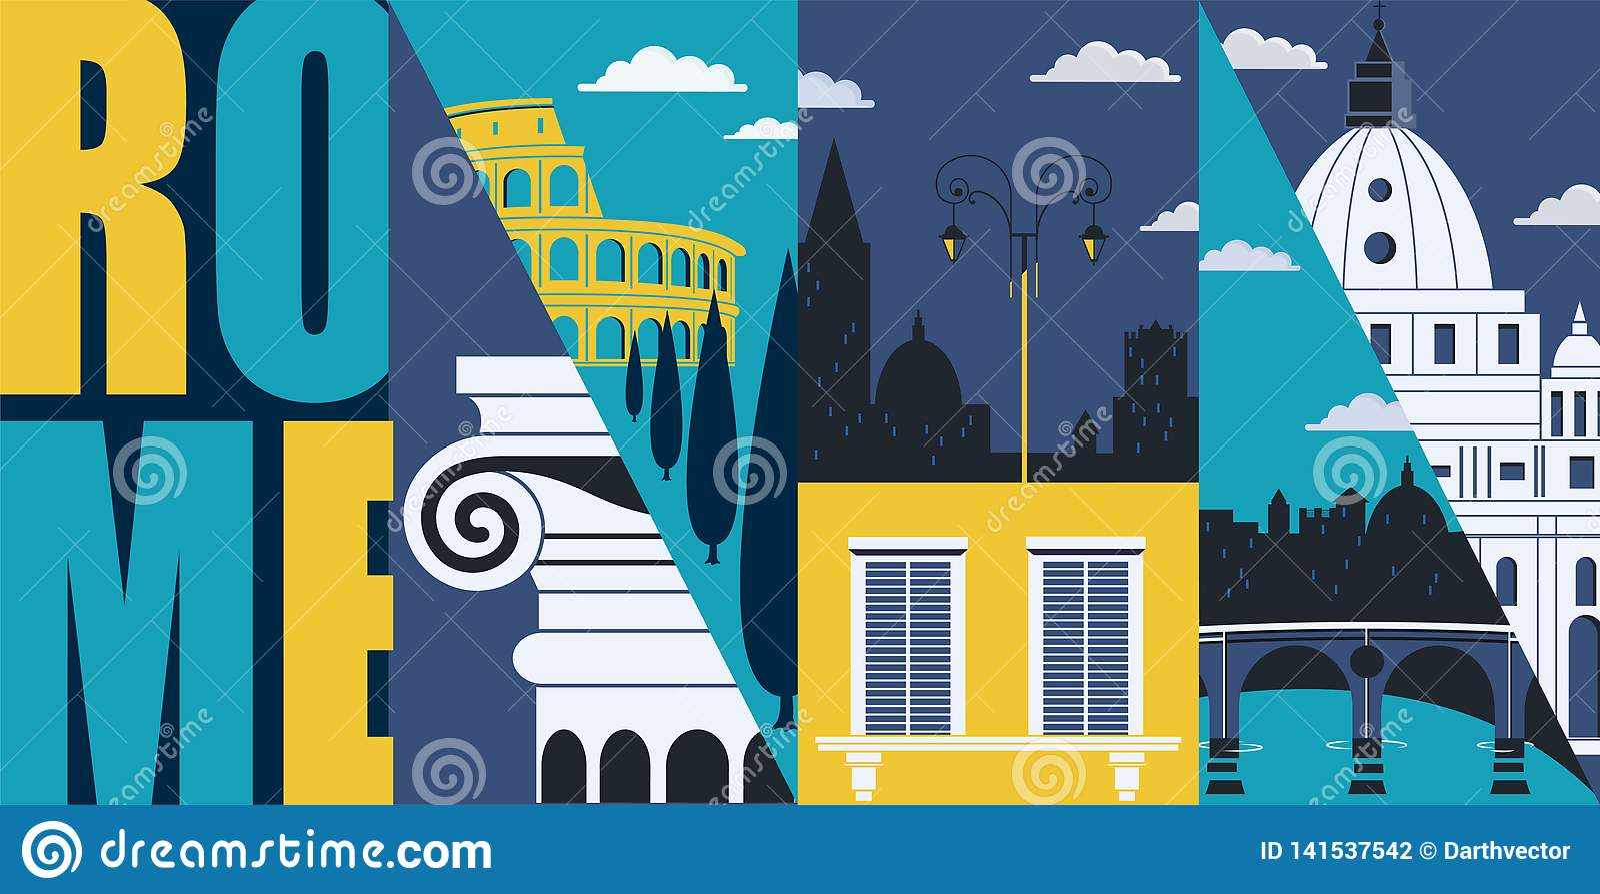 Rome  Italy Vector Banner  Illustration  City Skyline  Historical Buildings In Modern Flat